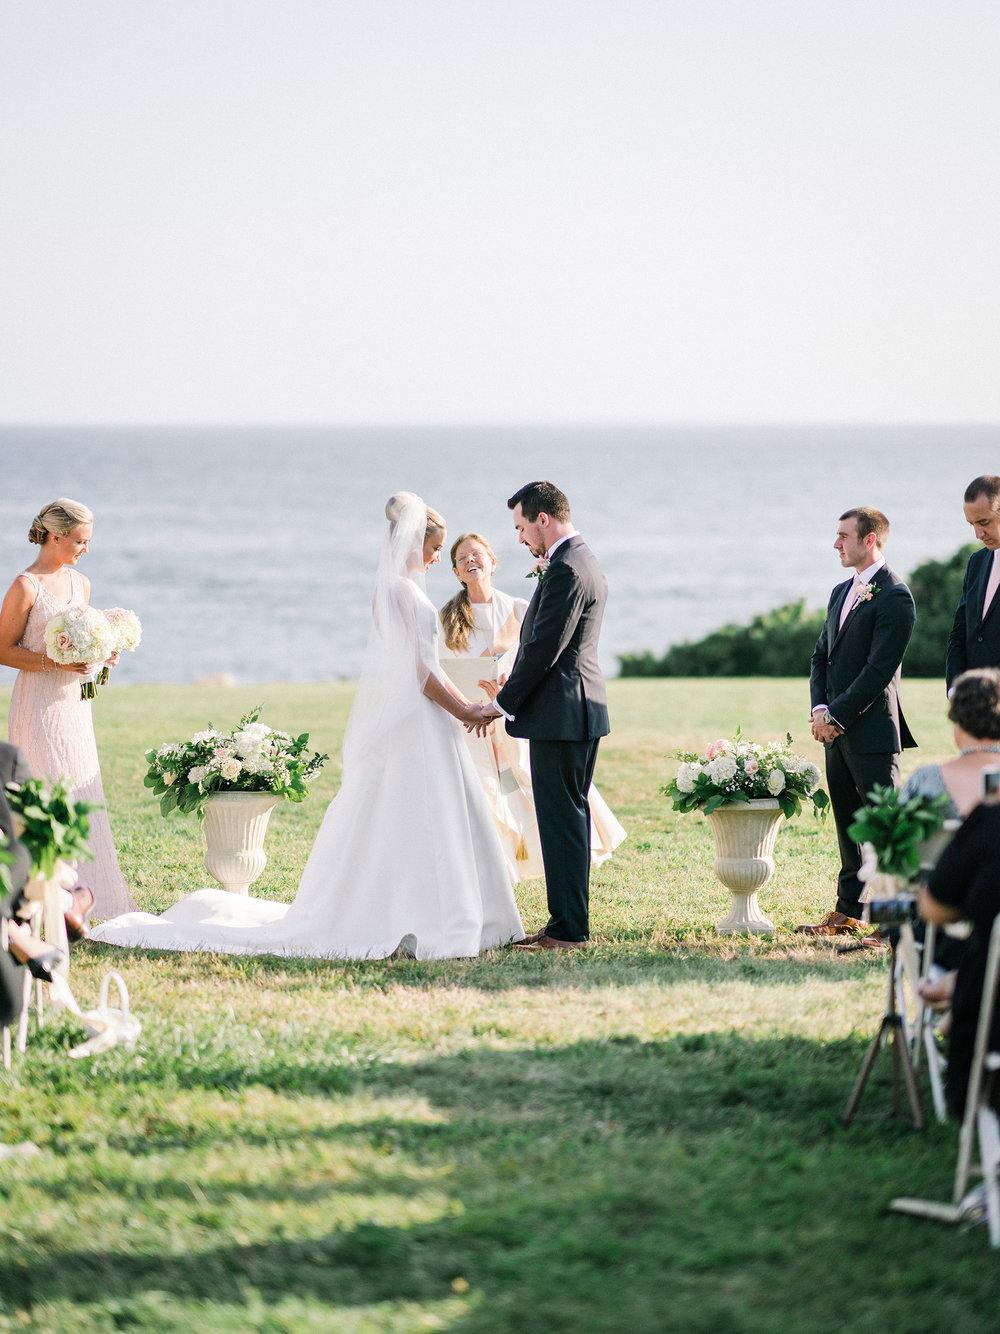 hannah-cochran-photography-bob-and-hayley-wedding-183.jpg